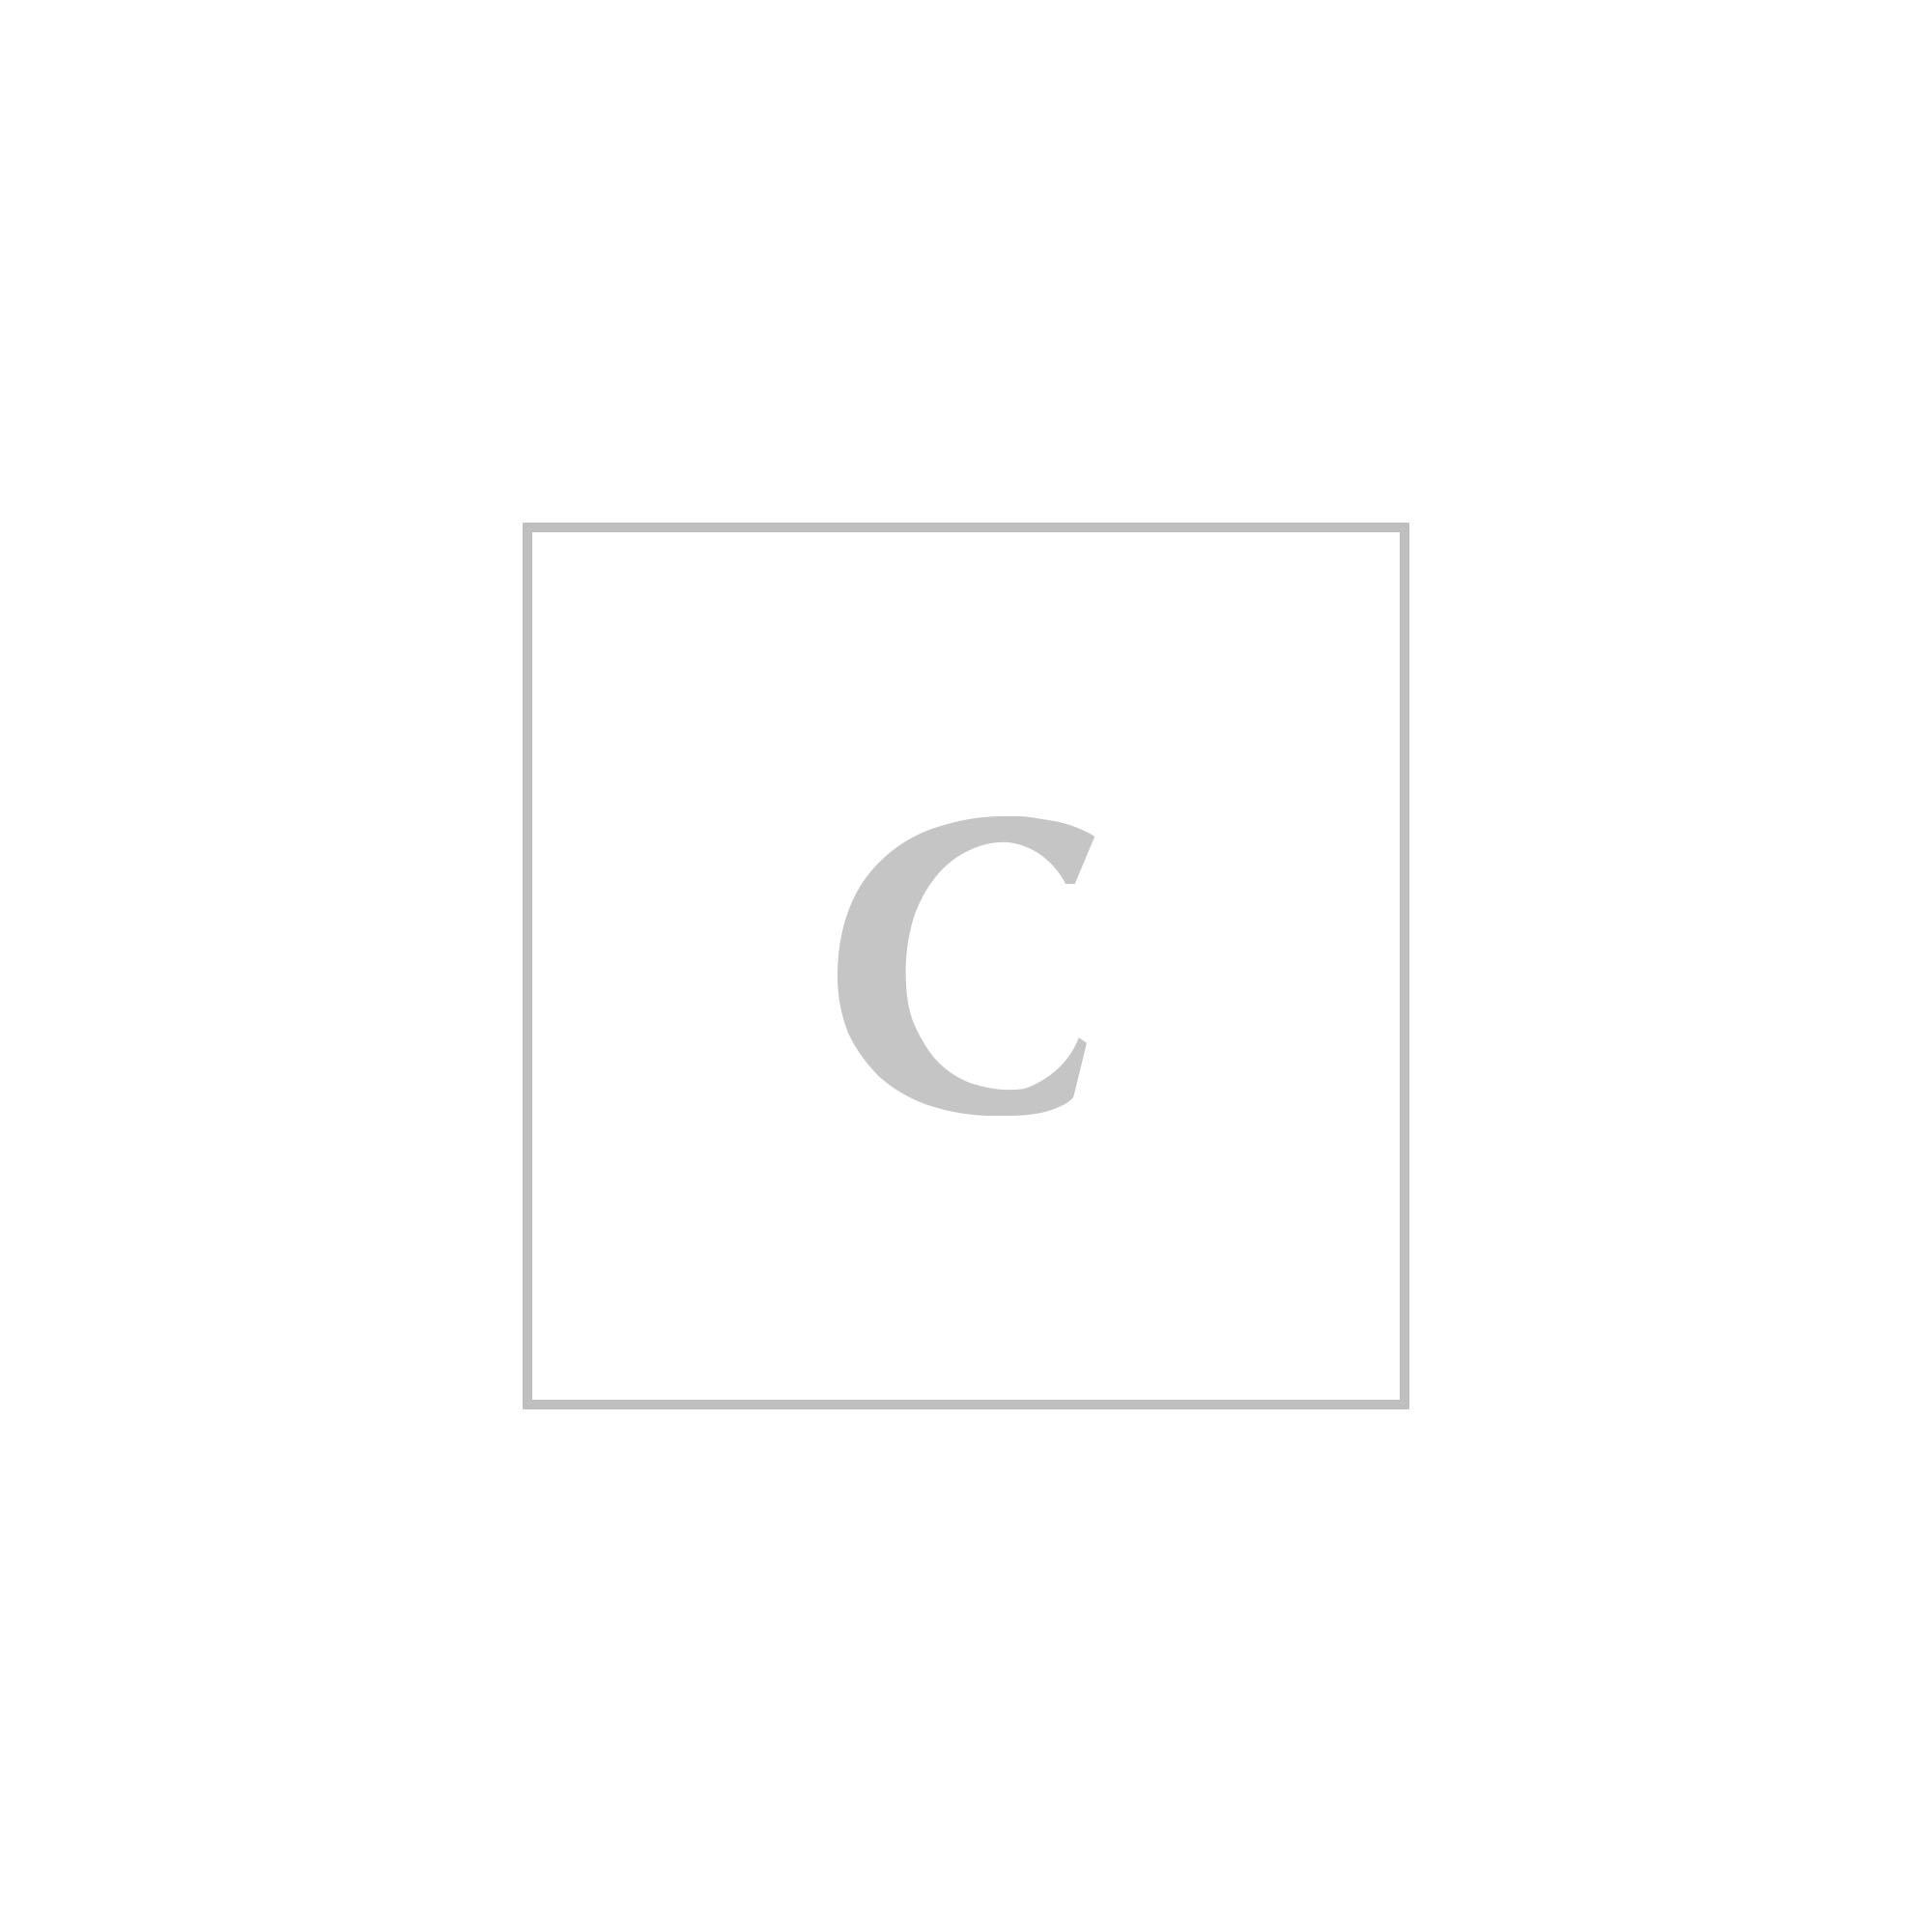 Michael kors cynthia medium satchel